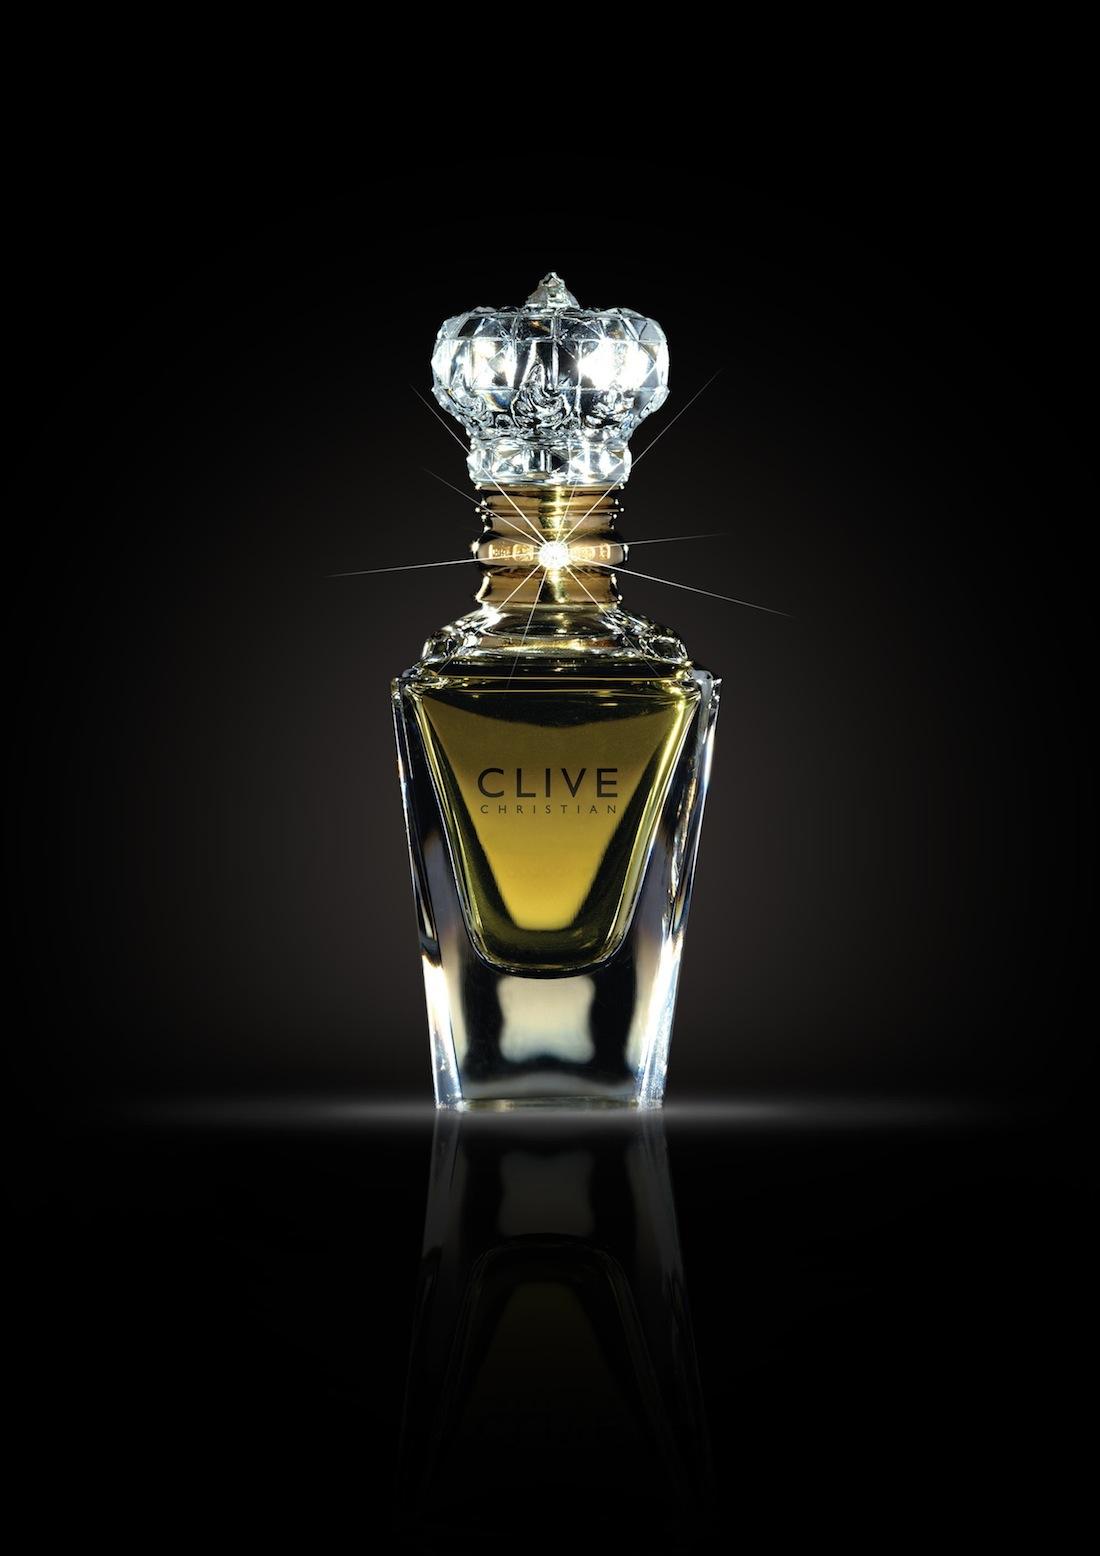 Clive majesty edition